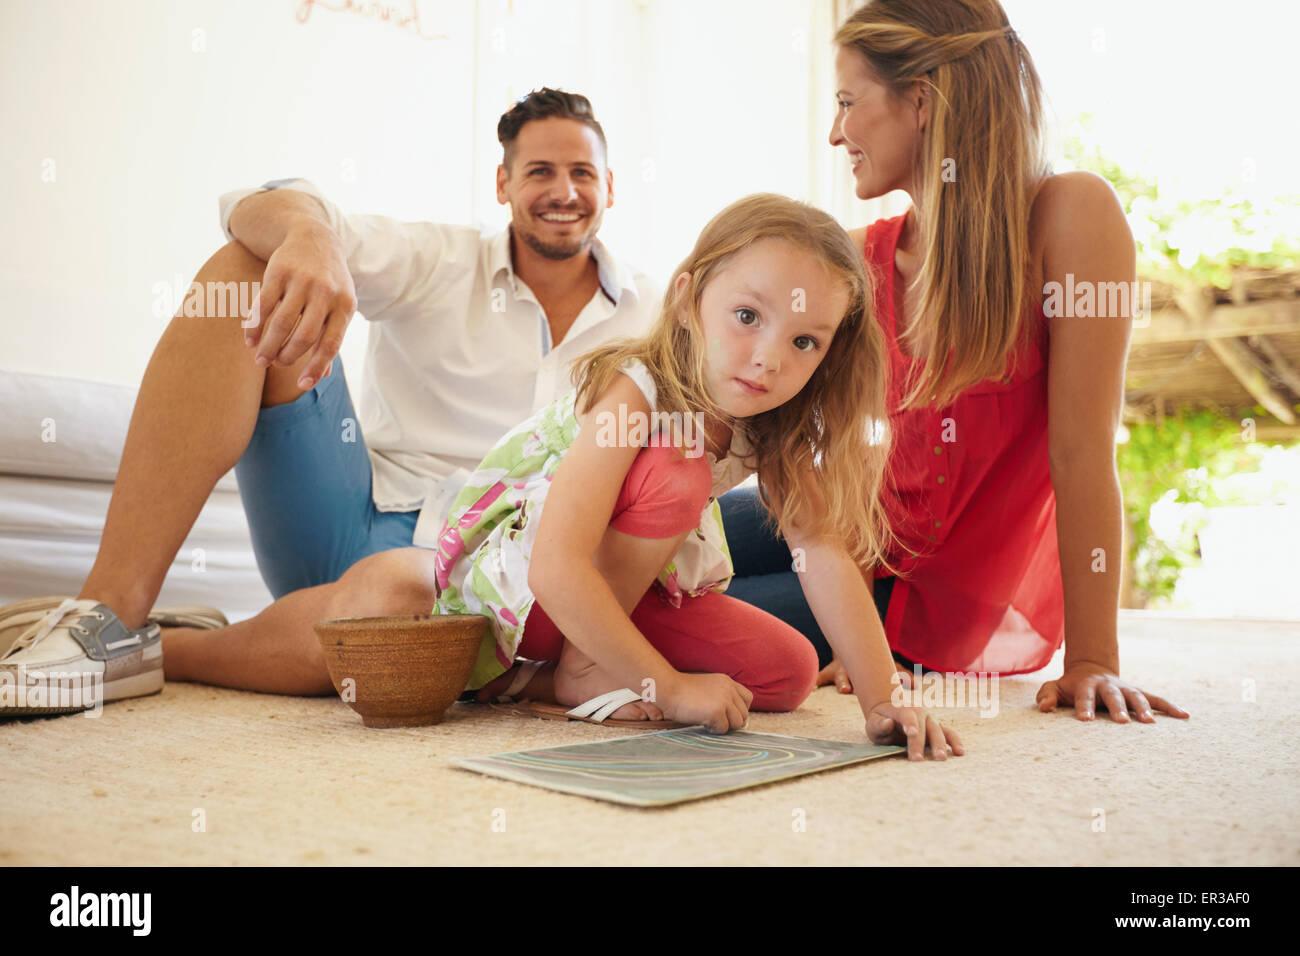 Filmación en interiores de cute little girl pintar con sus padres sentados detrás de ella. Familia sentada Imagen De Stock